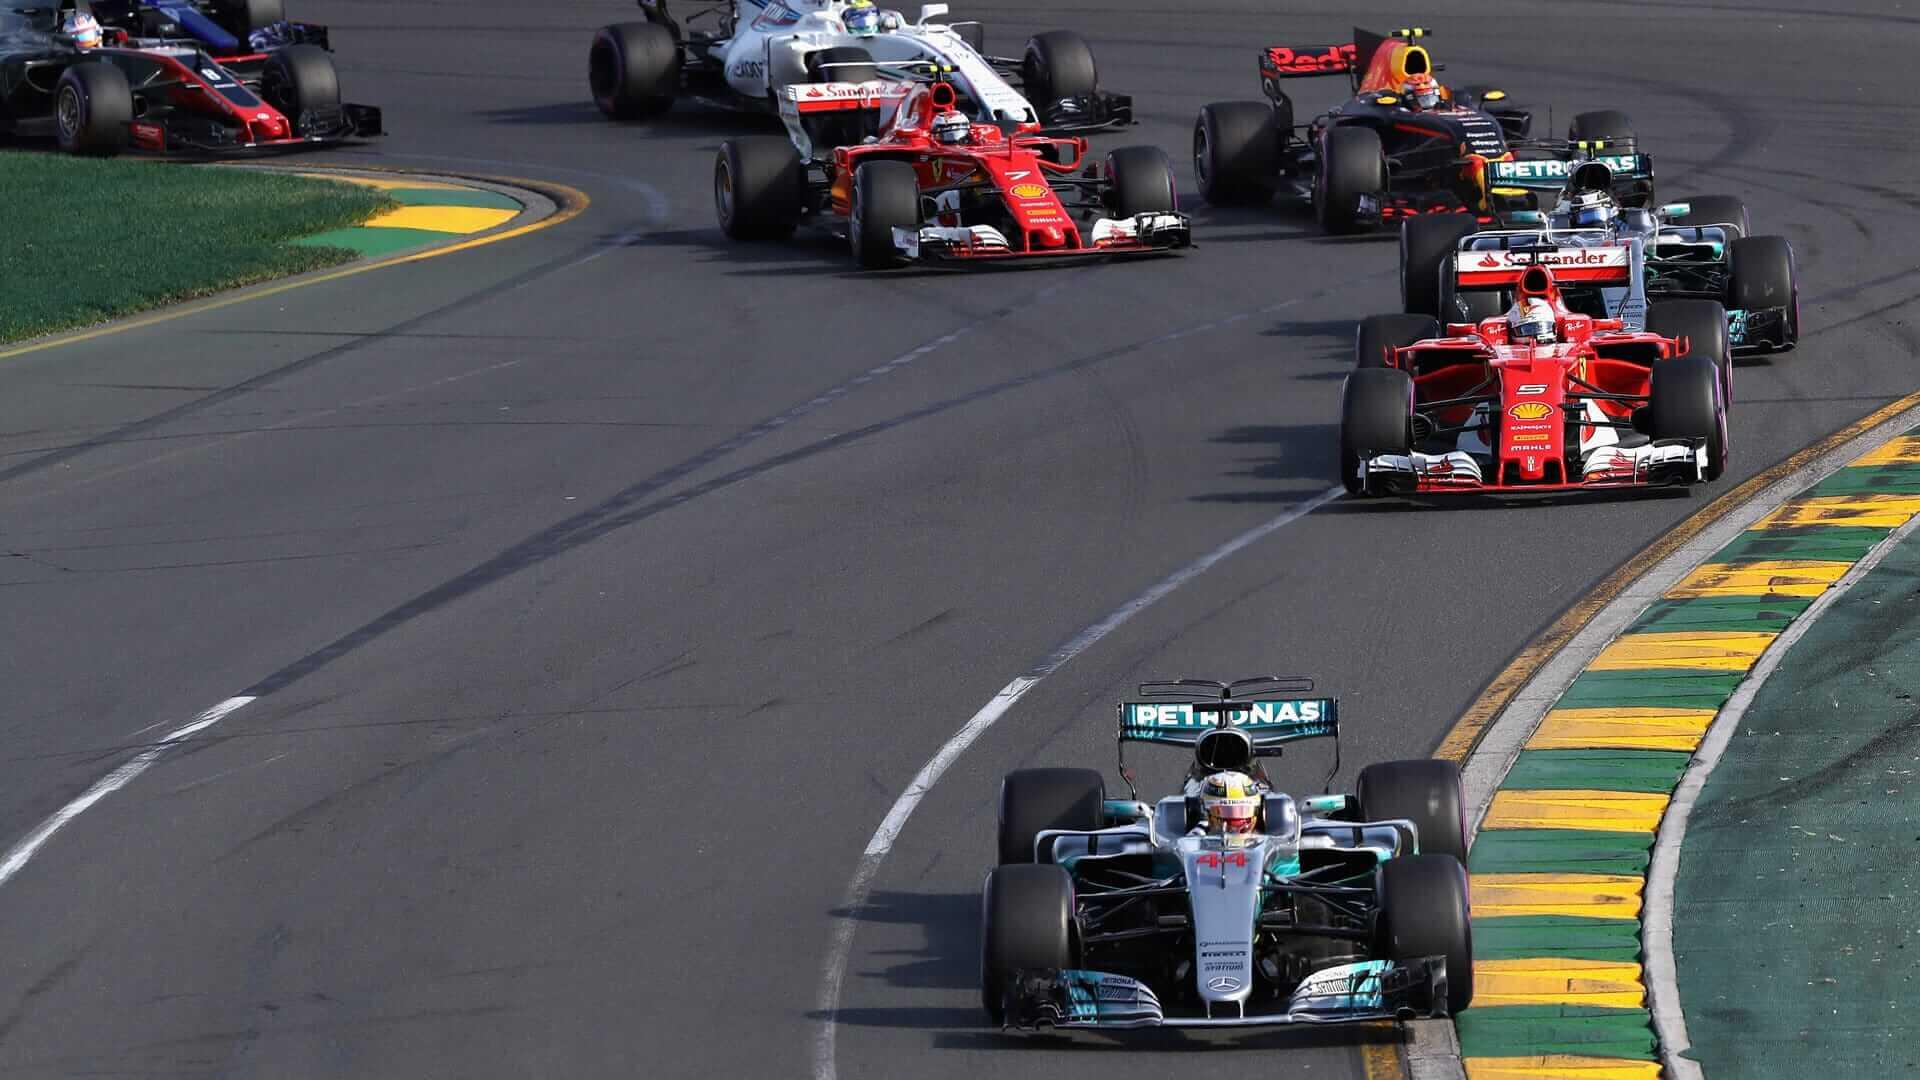 F1 2017 Download Free